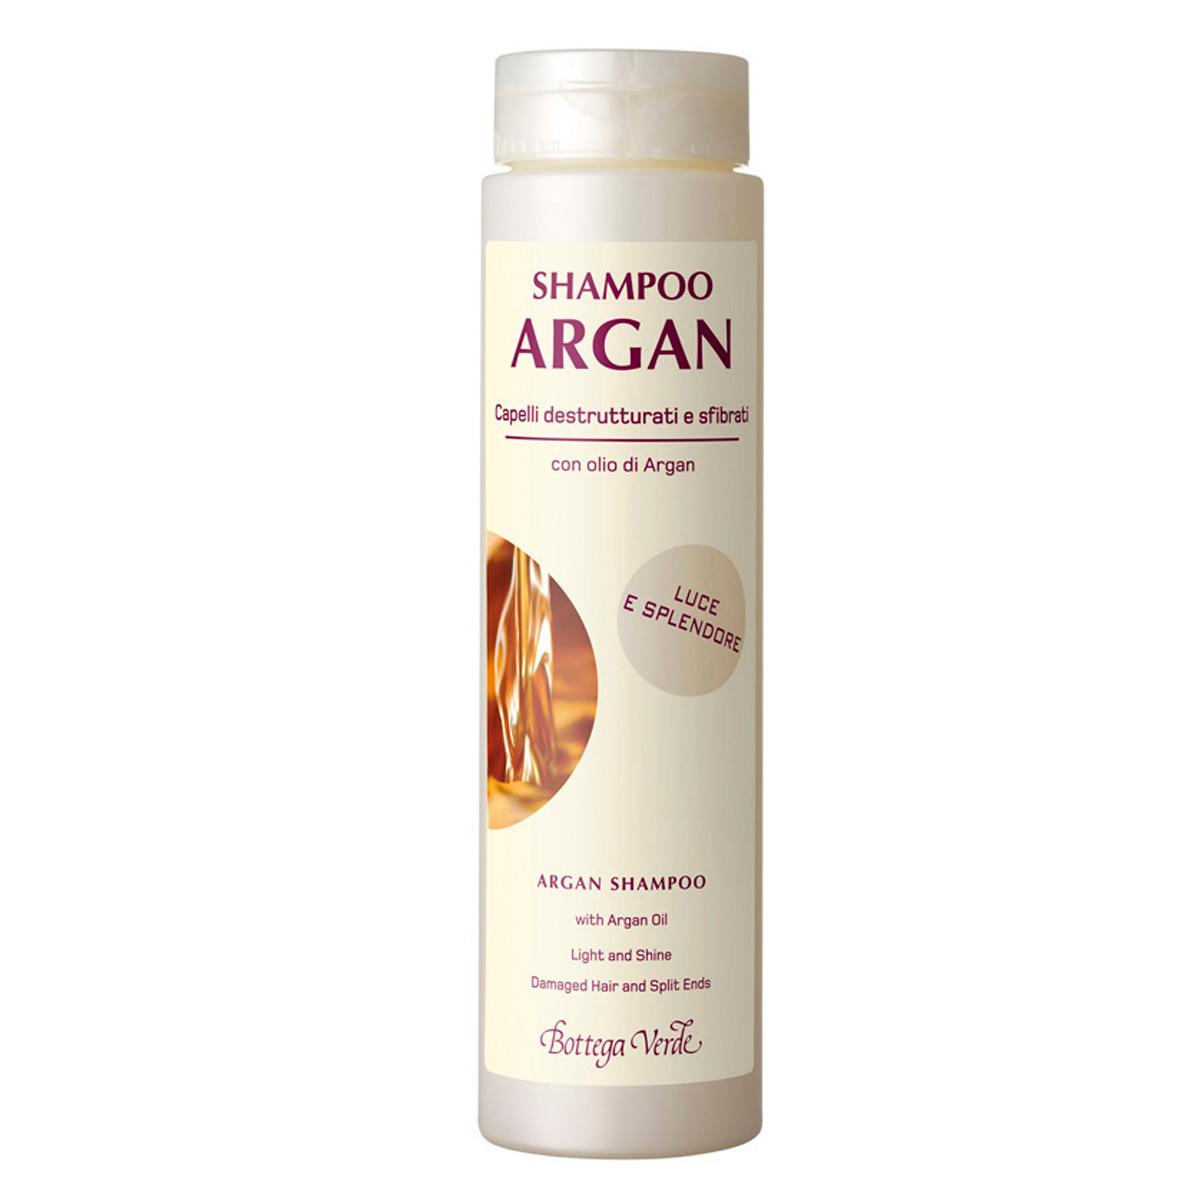 Sampon cu ulei de argan pentru parul deteriorat si uscat, efect de stralucire - Argan del Marocco, 200 ML